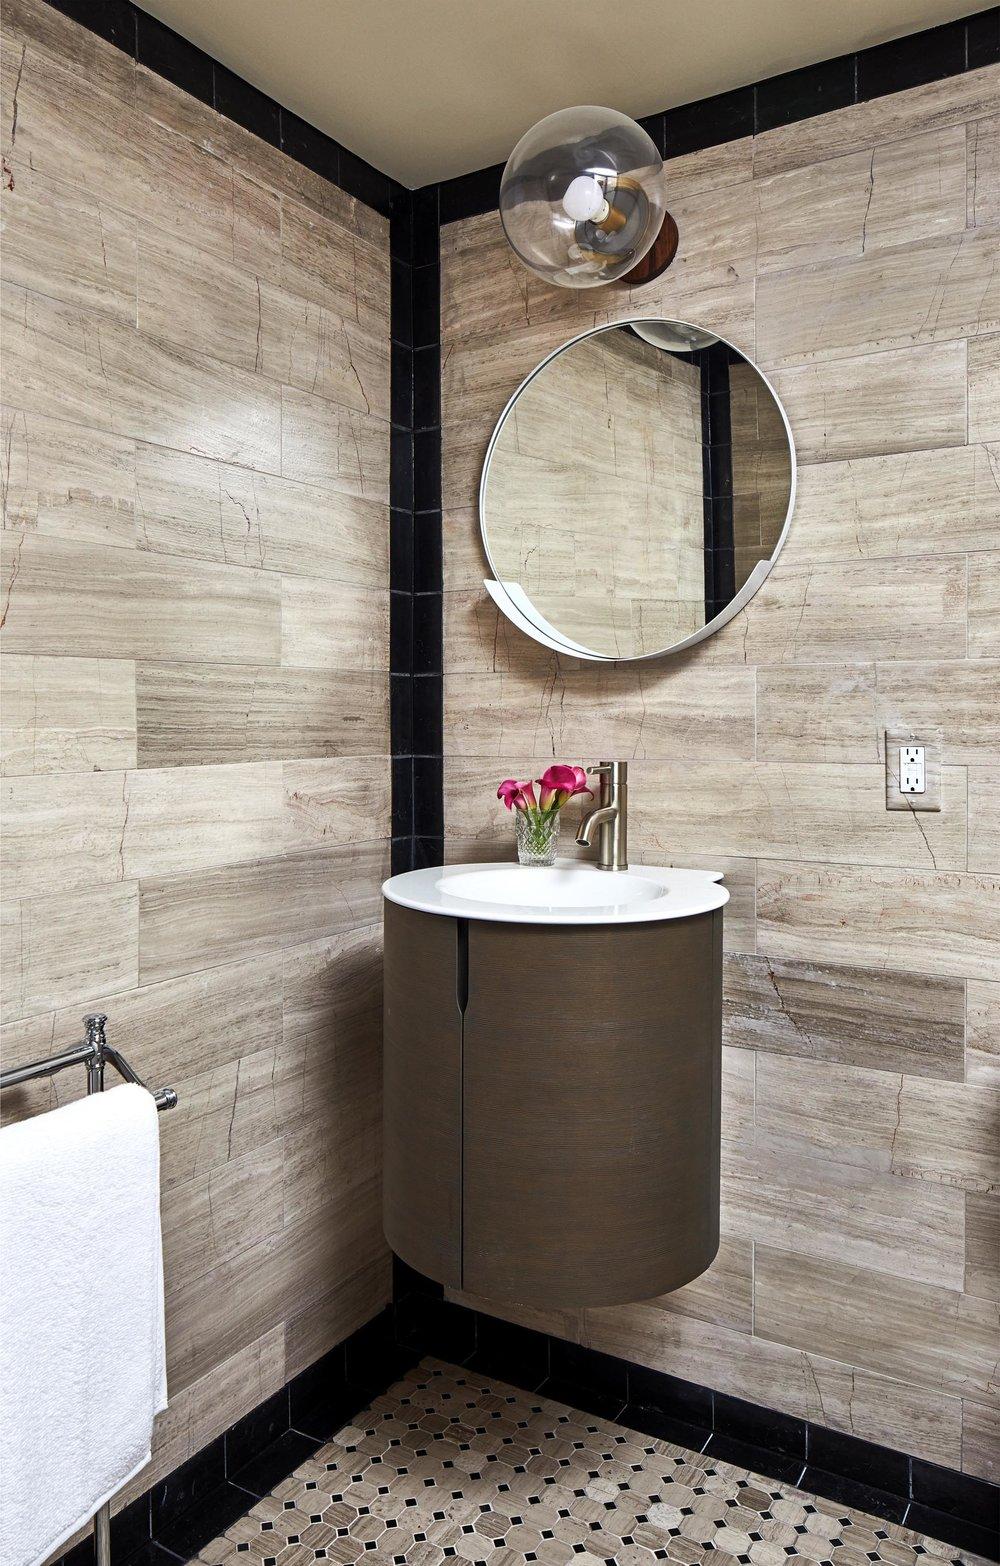 24-Modern-Contemporary-Stone-Bathroom-Bath-Room-Top-Decorator-Best-Interior-Designers-Boston-South-End-Back-Bay-Seaport-Dane-Austin-Design.jpg